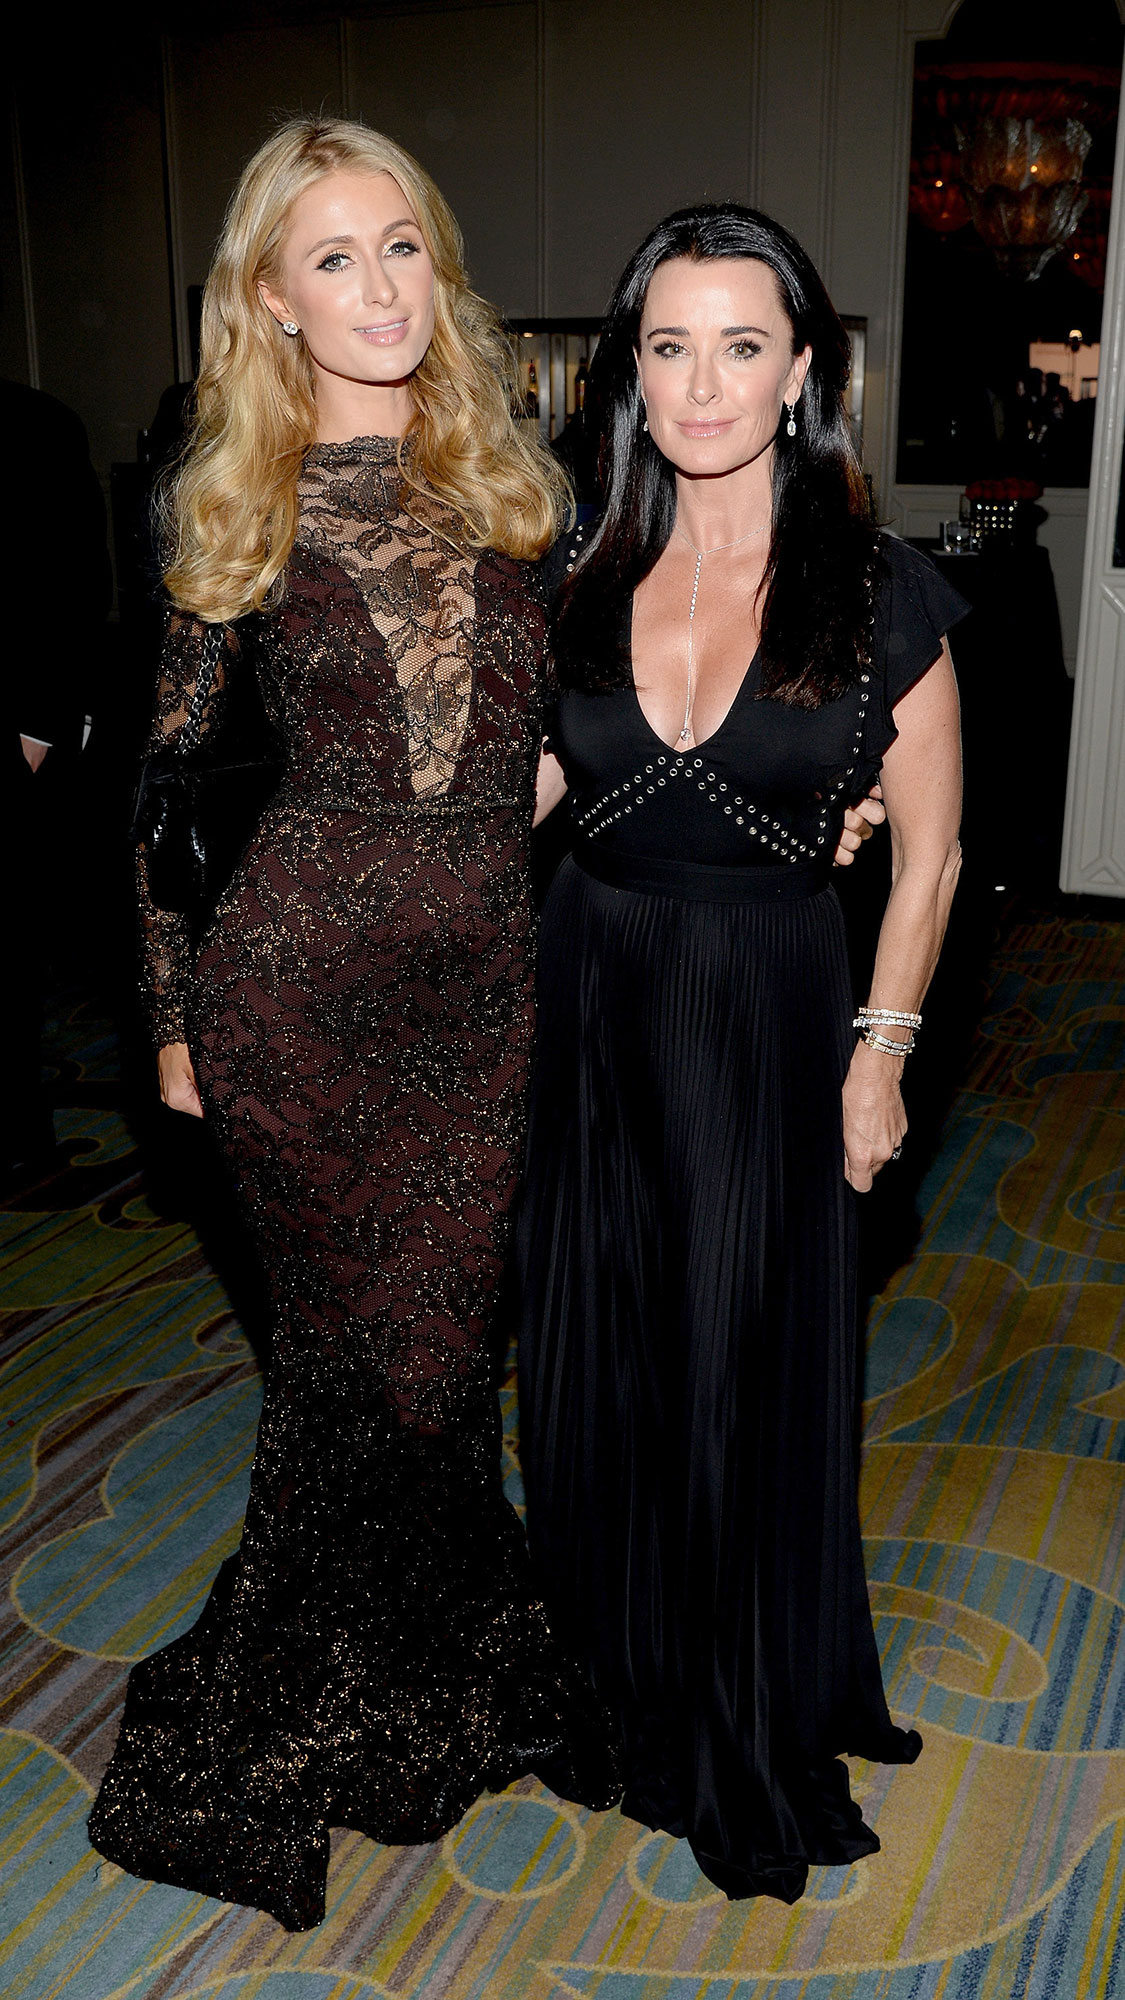 Kyle Richards Knows Niece Paris Hilton Will Find Love Again - Paris Hilton (L) and Kyle Richards